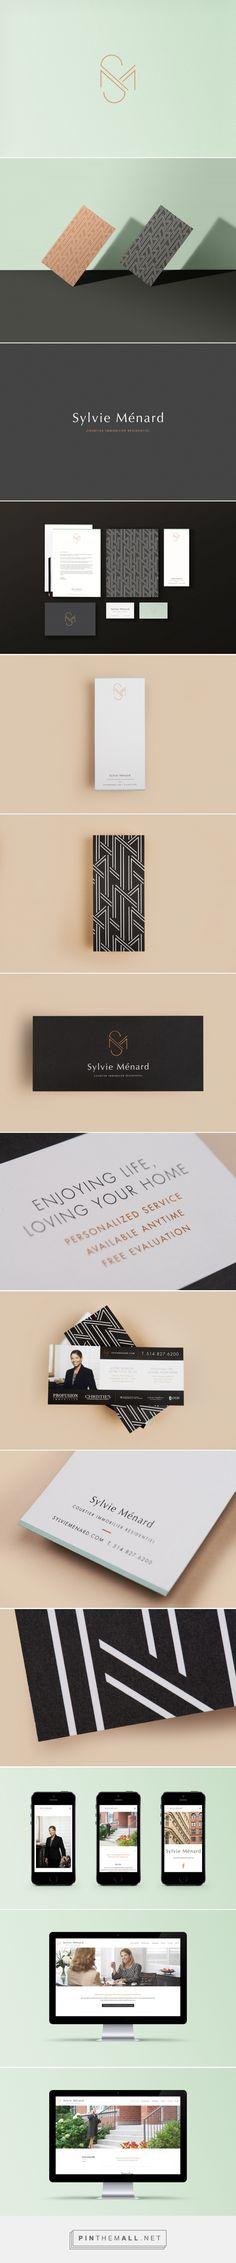 Sylvie Menard Premium Real Estate Broker by ByeBye Bambi   Fivestar Branding Agency – Design and Branding Agency & Curated Inspiration Gallery